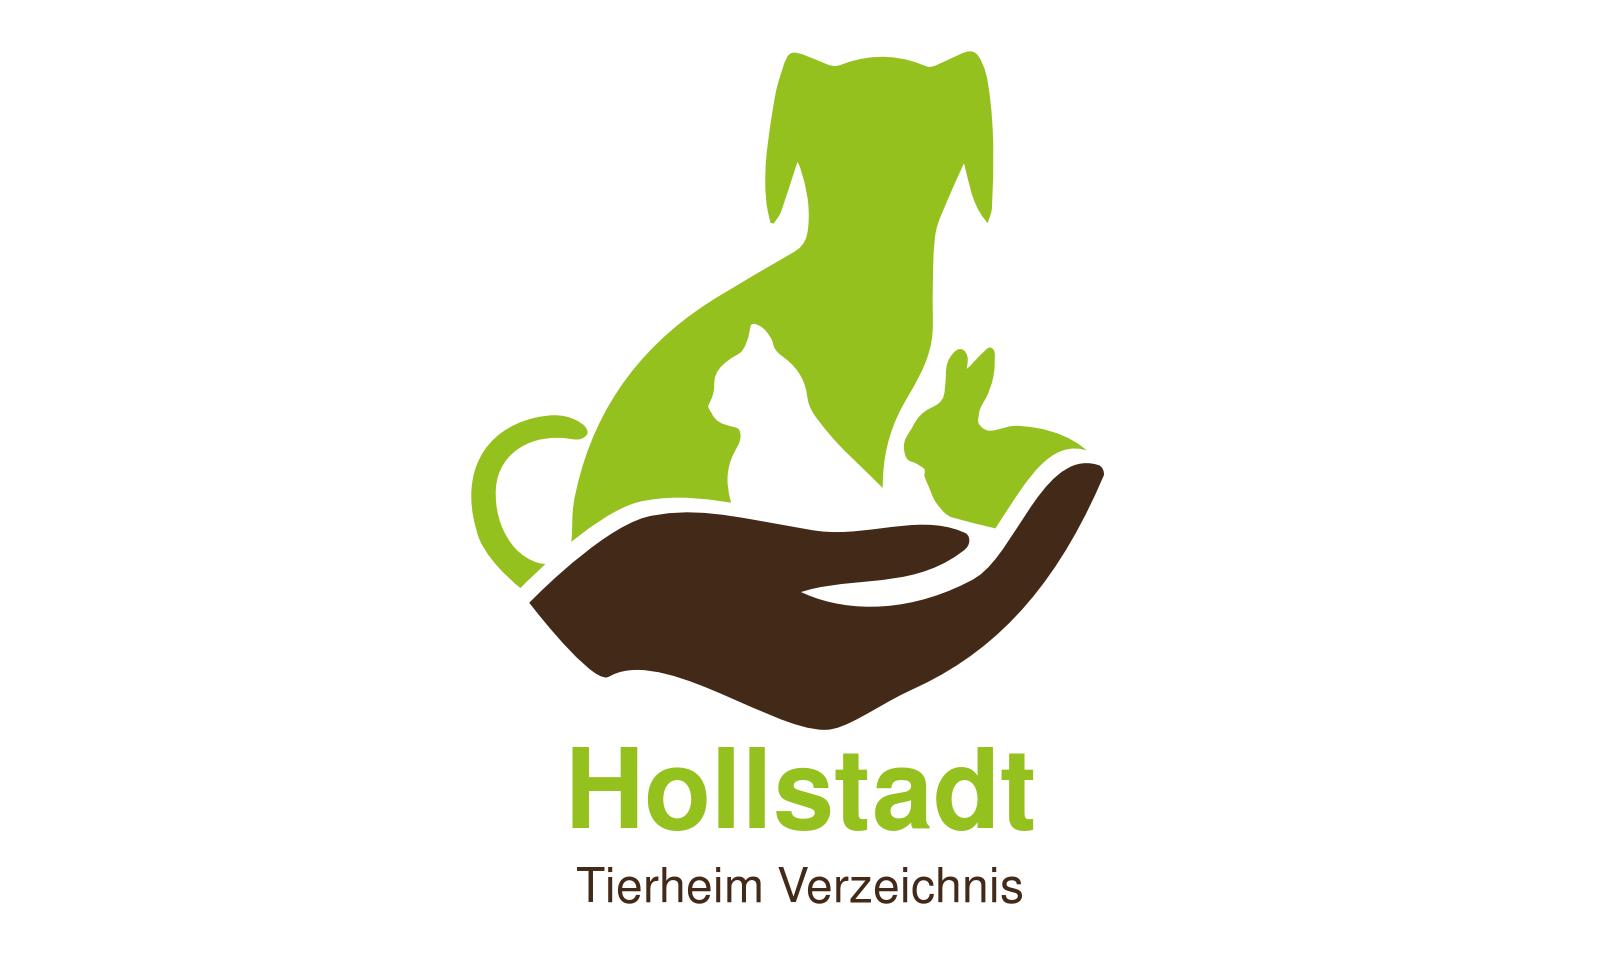 Tierheim Hollstadt